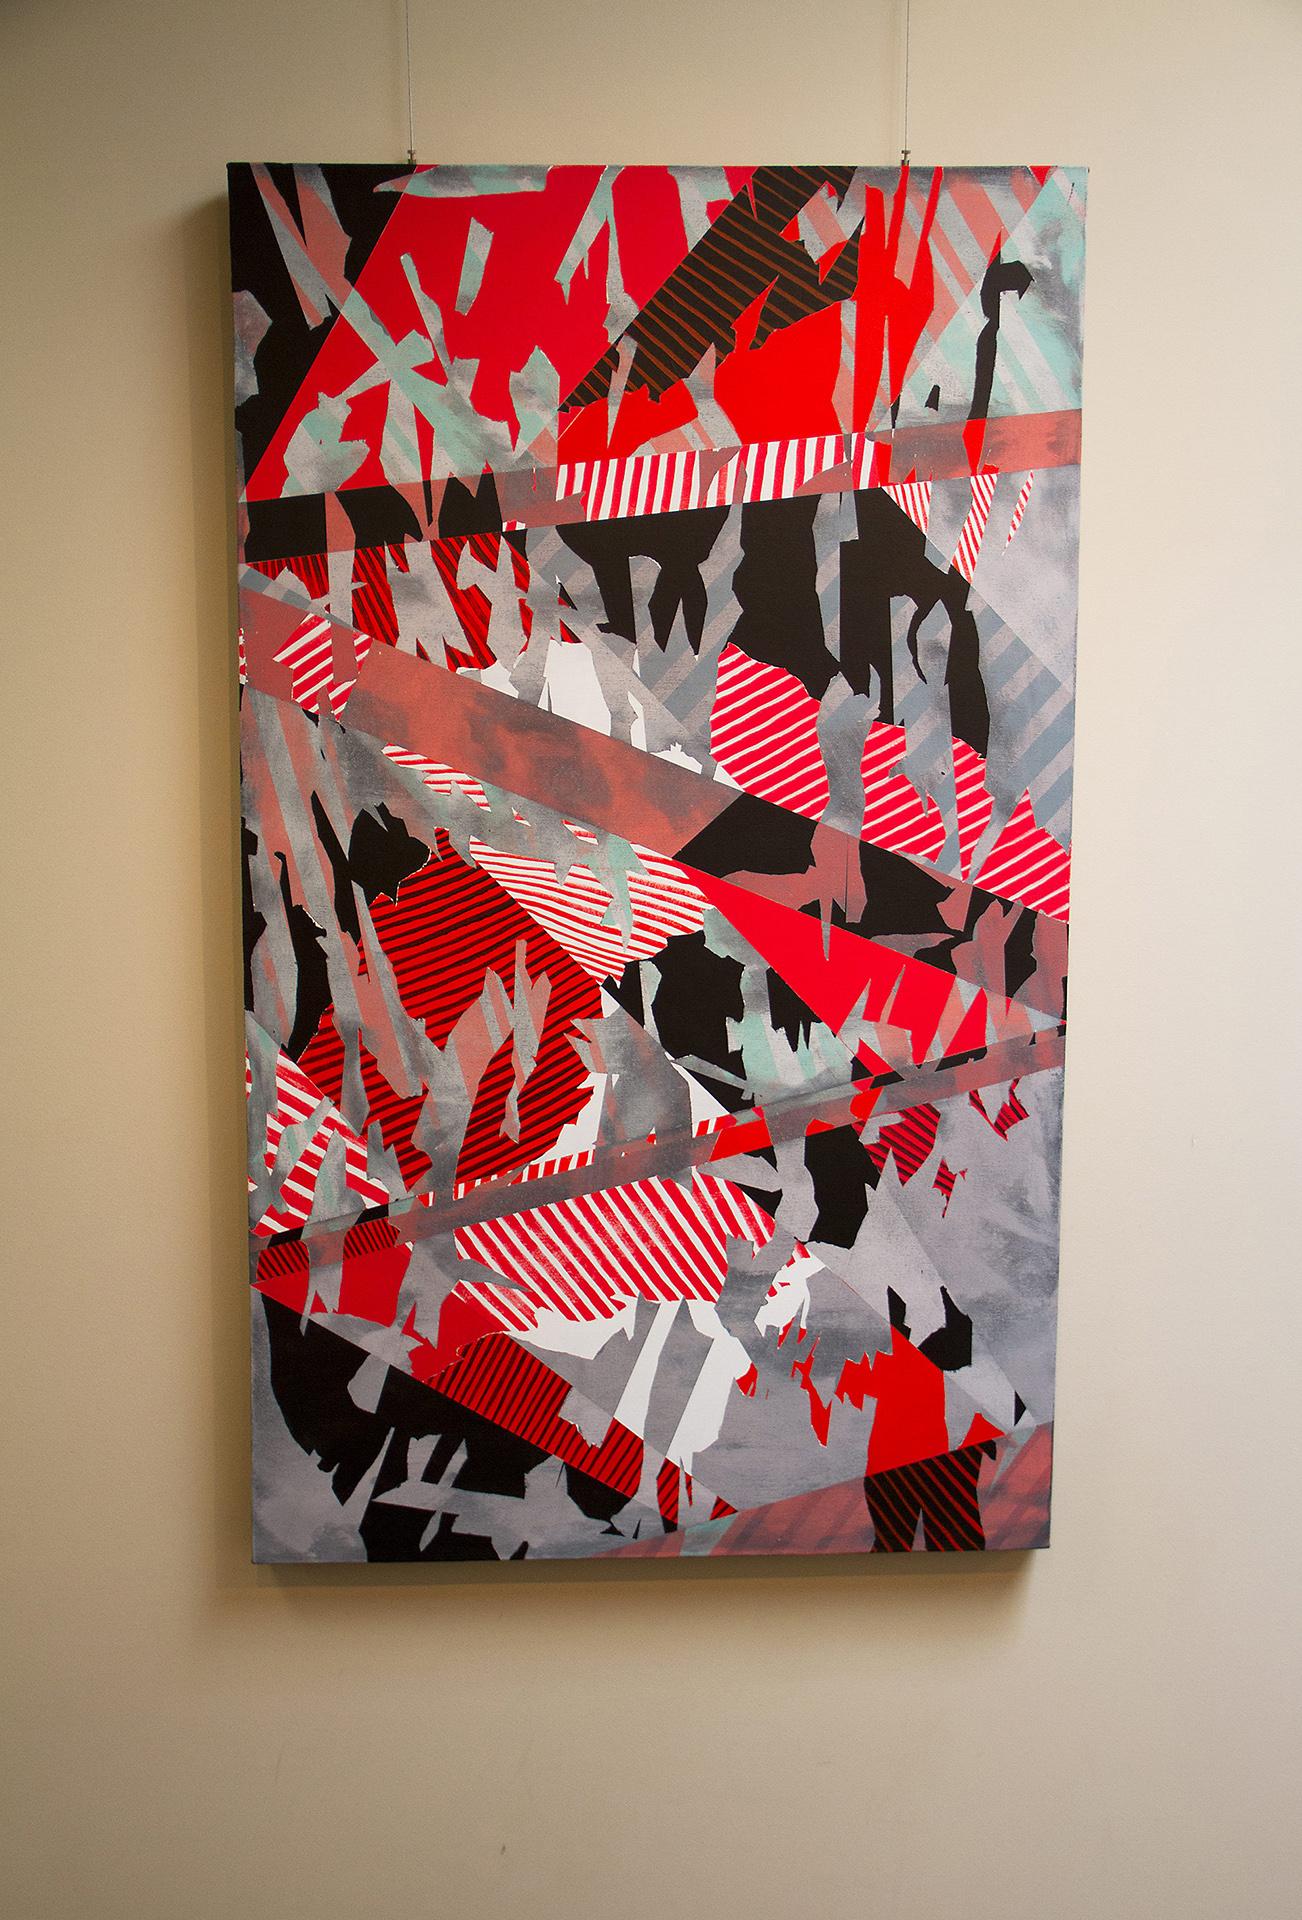 Levi Nelson - Kintsugi - Acrylic on canvas